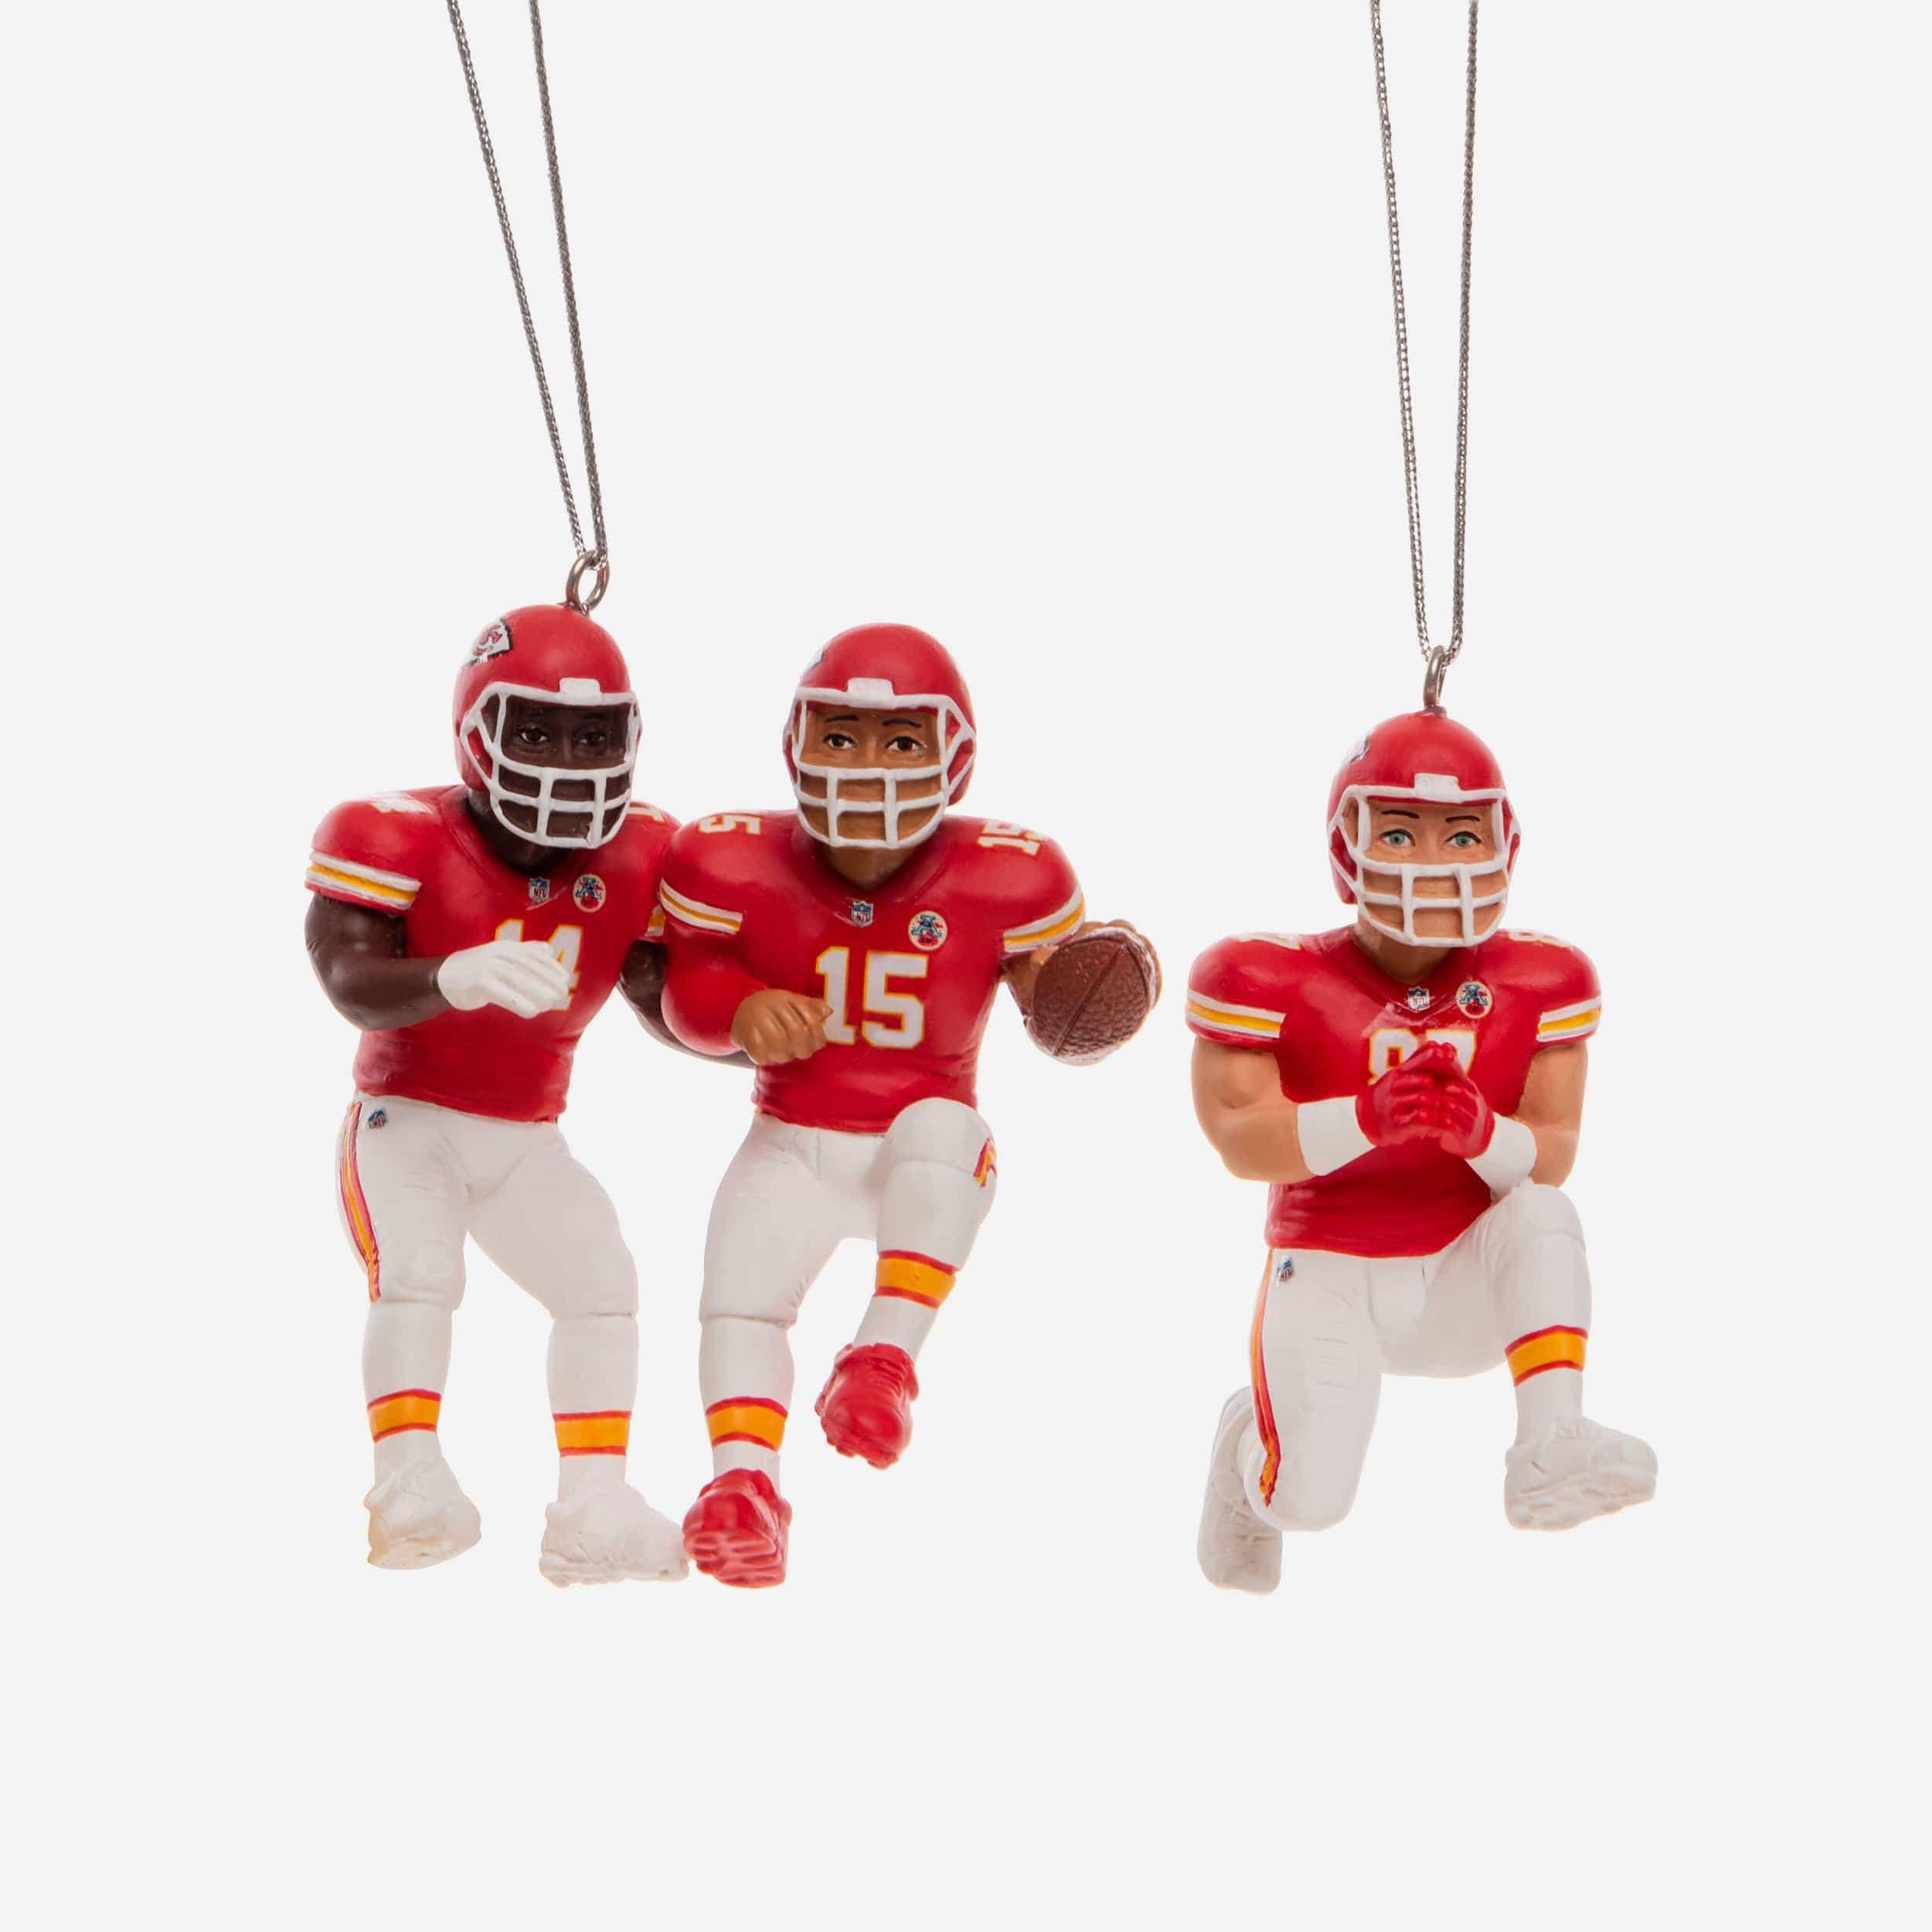 FOCO Kansas City Chiefs 3 Player Team Celebration Ornament